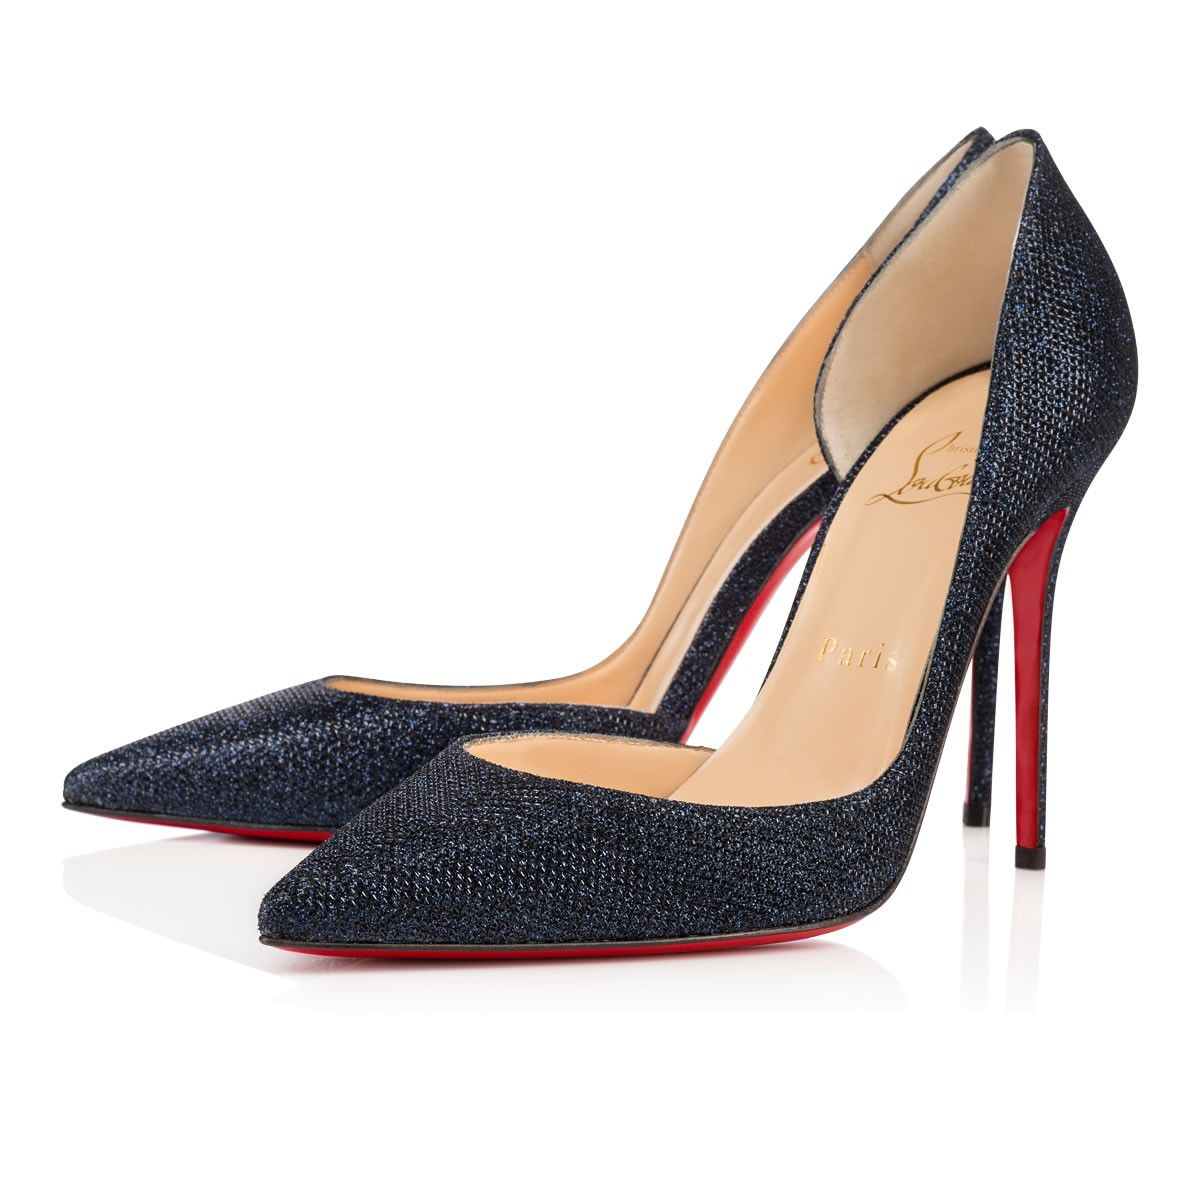 christian louboutin navy blue shoes